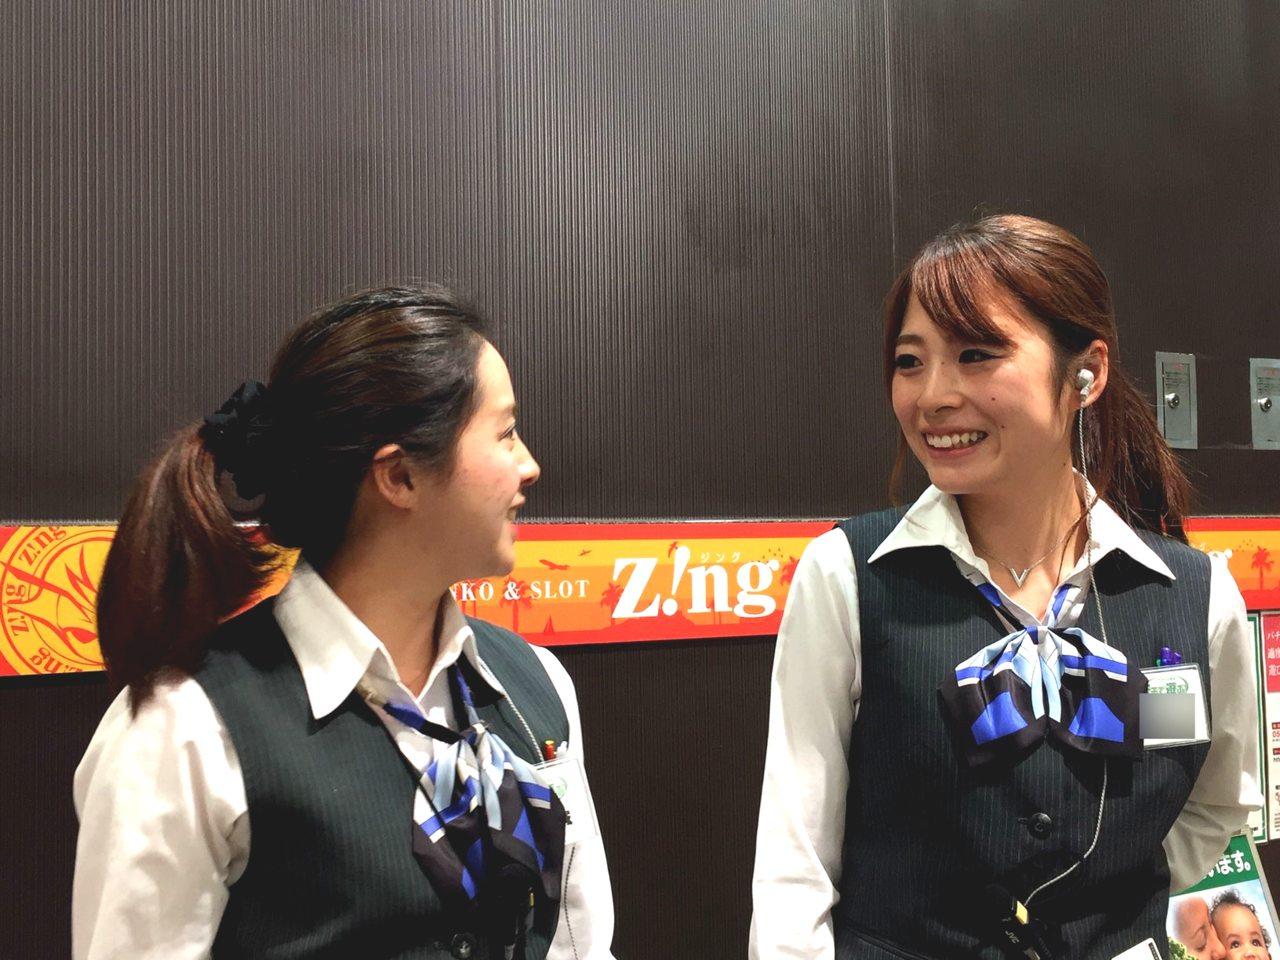 【急募】(1)接客/ホール [正](未経験者歓迎)